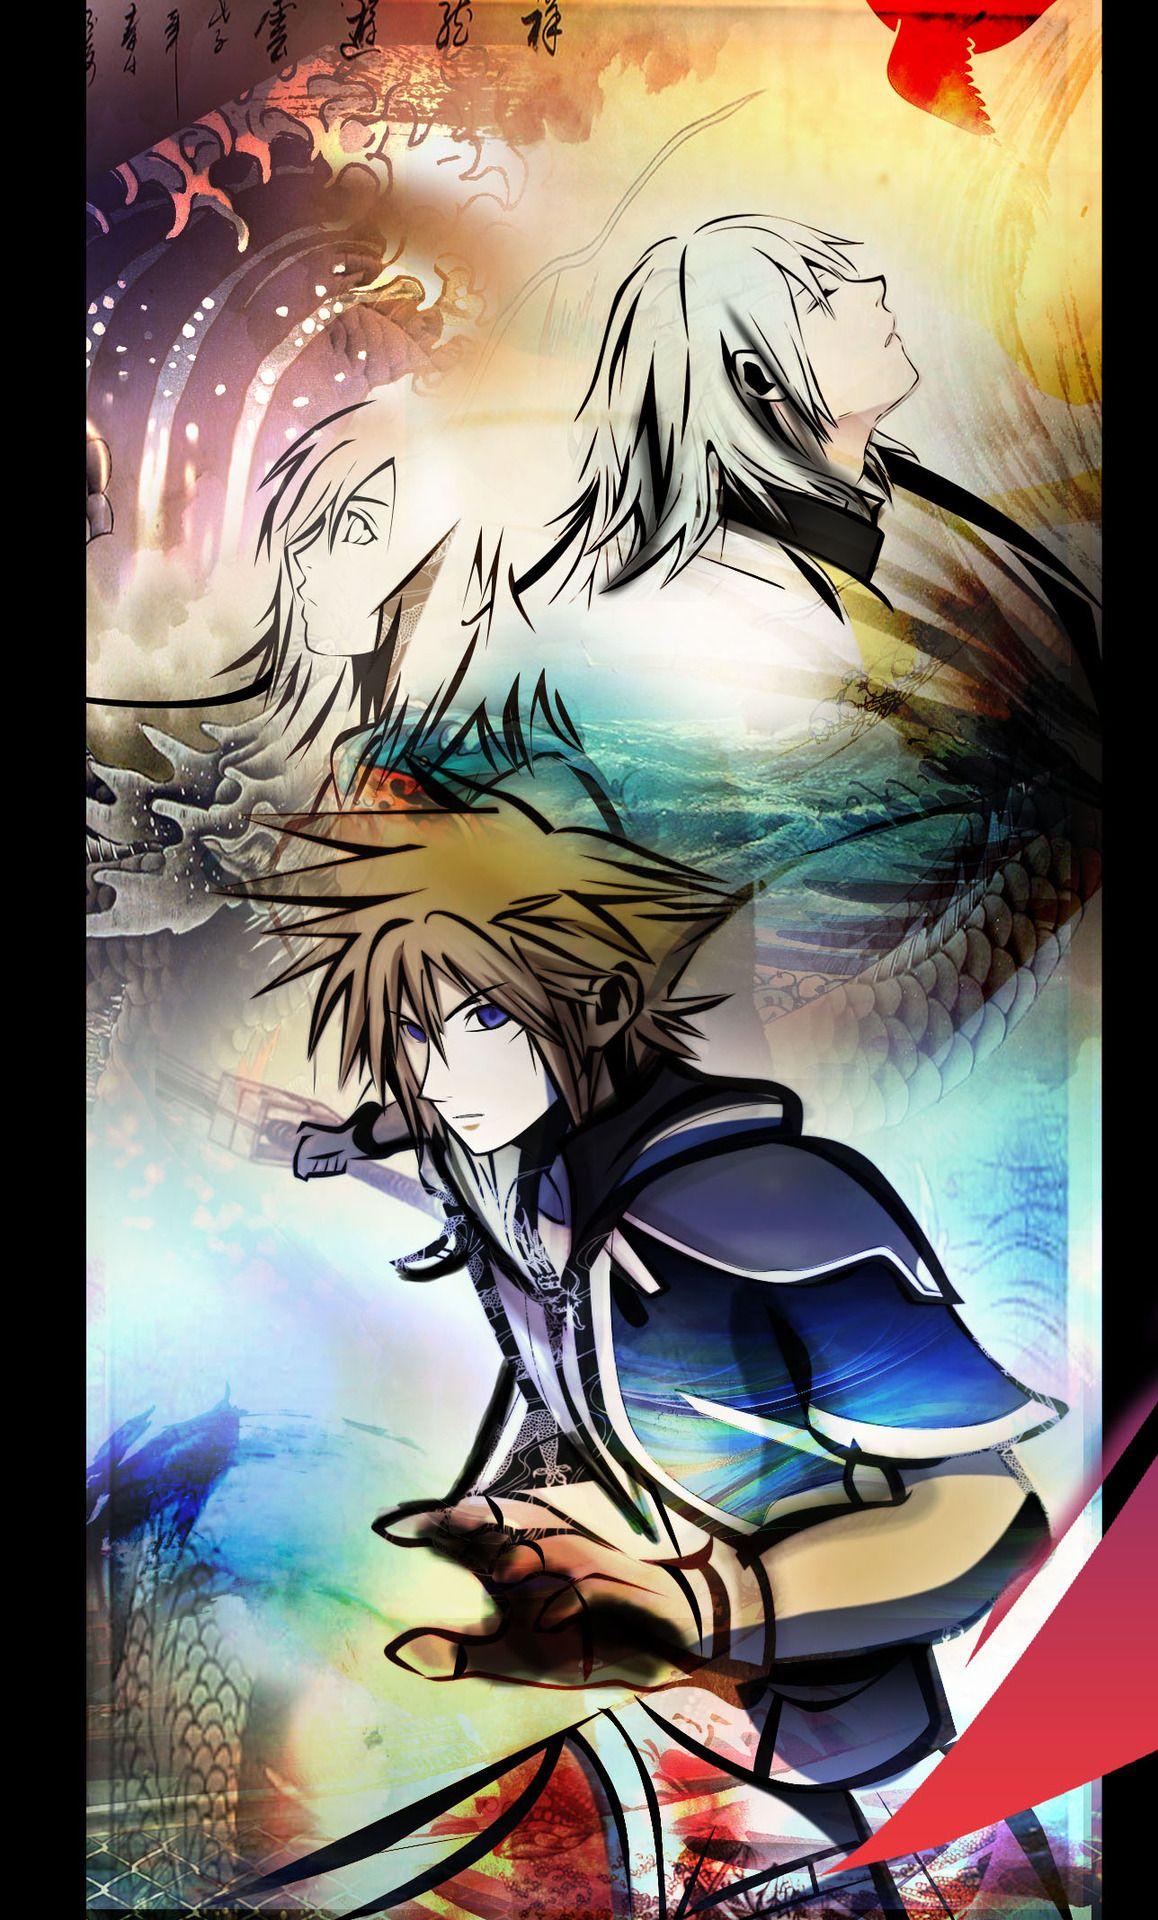 Kingdom Hearts (With images) | Kingdom hearts art, Kingdom